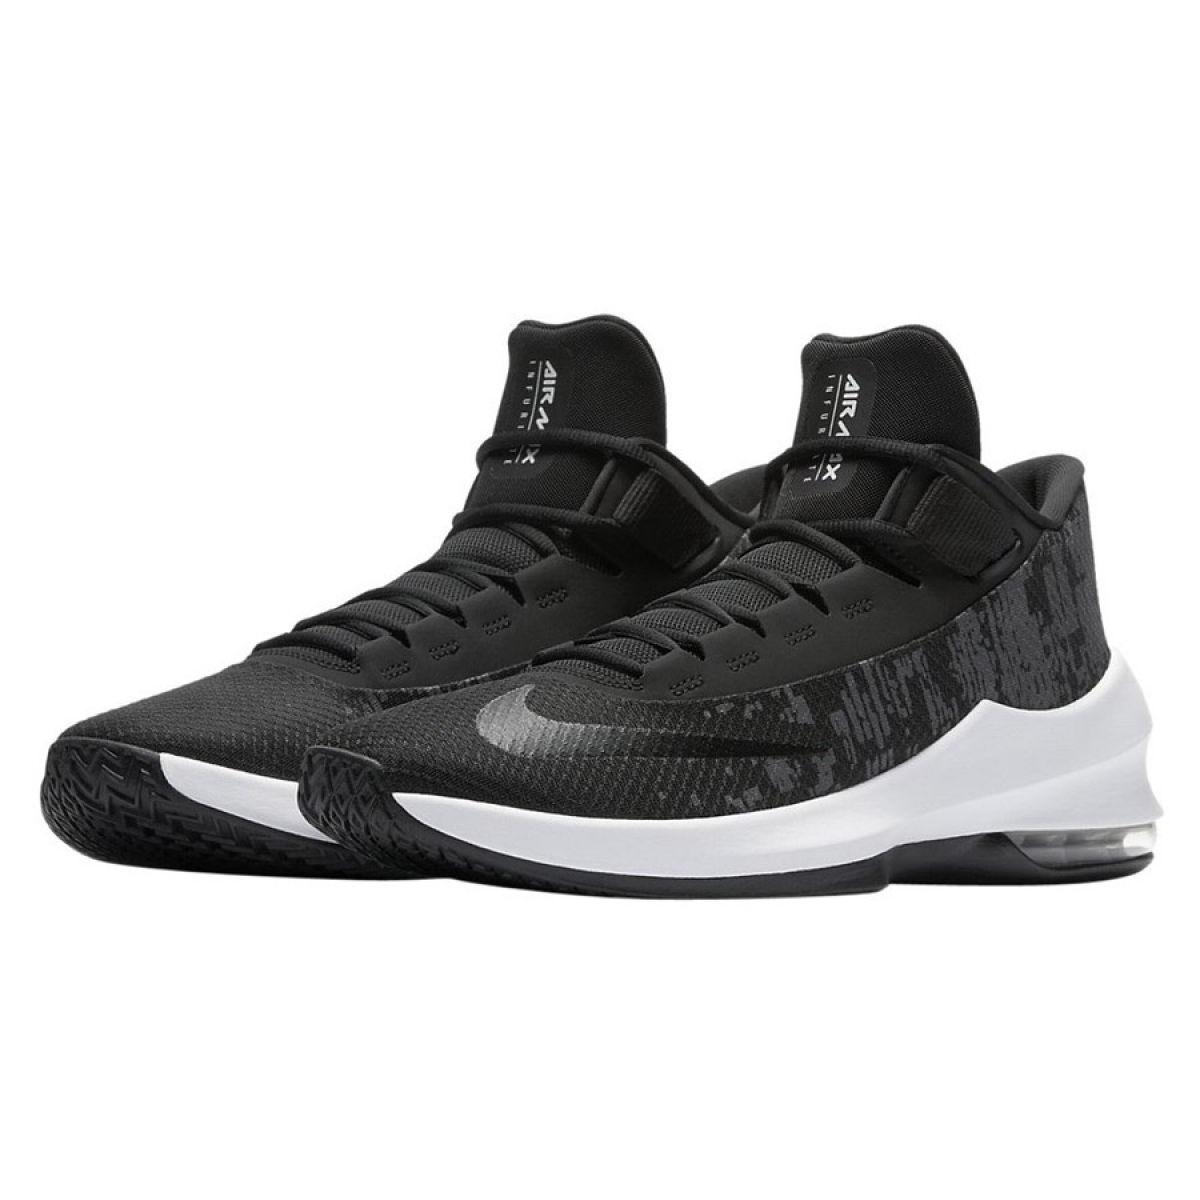 Tênis de basquete Nike Air Max Infuriate 2 Mid M AA7066 001 preto preto